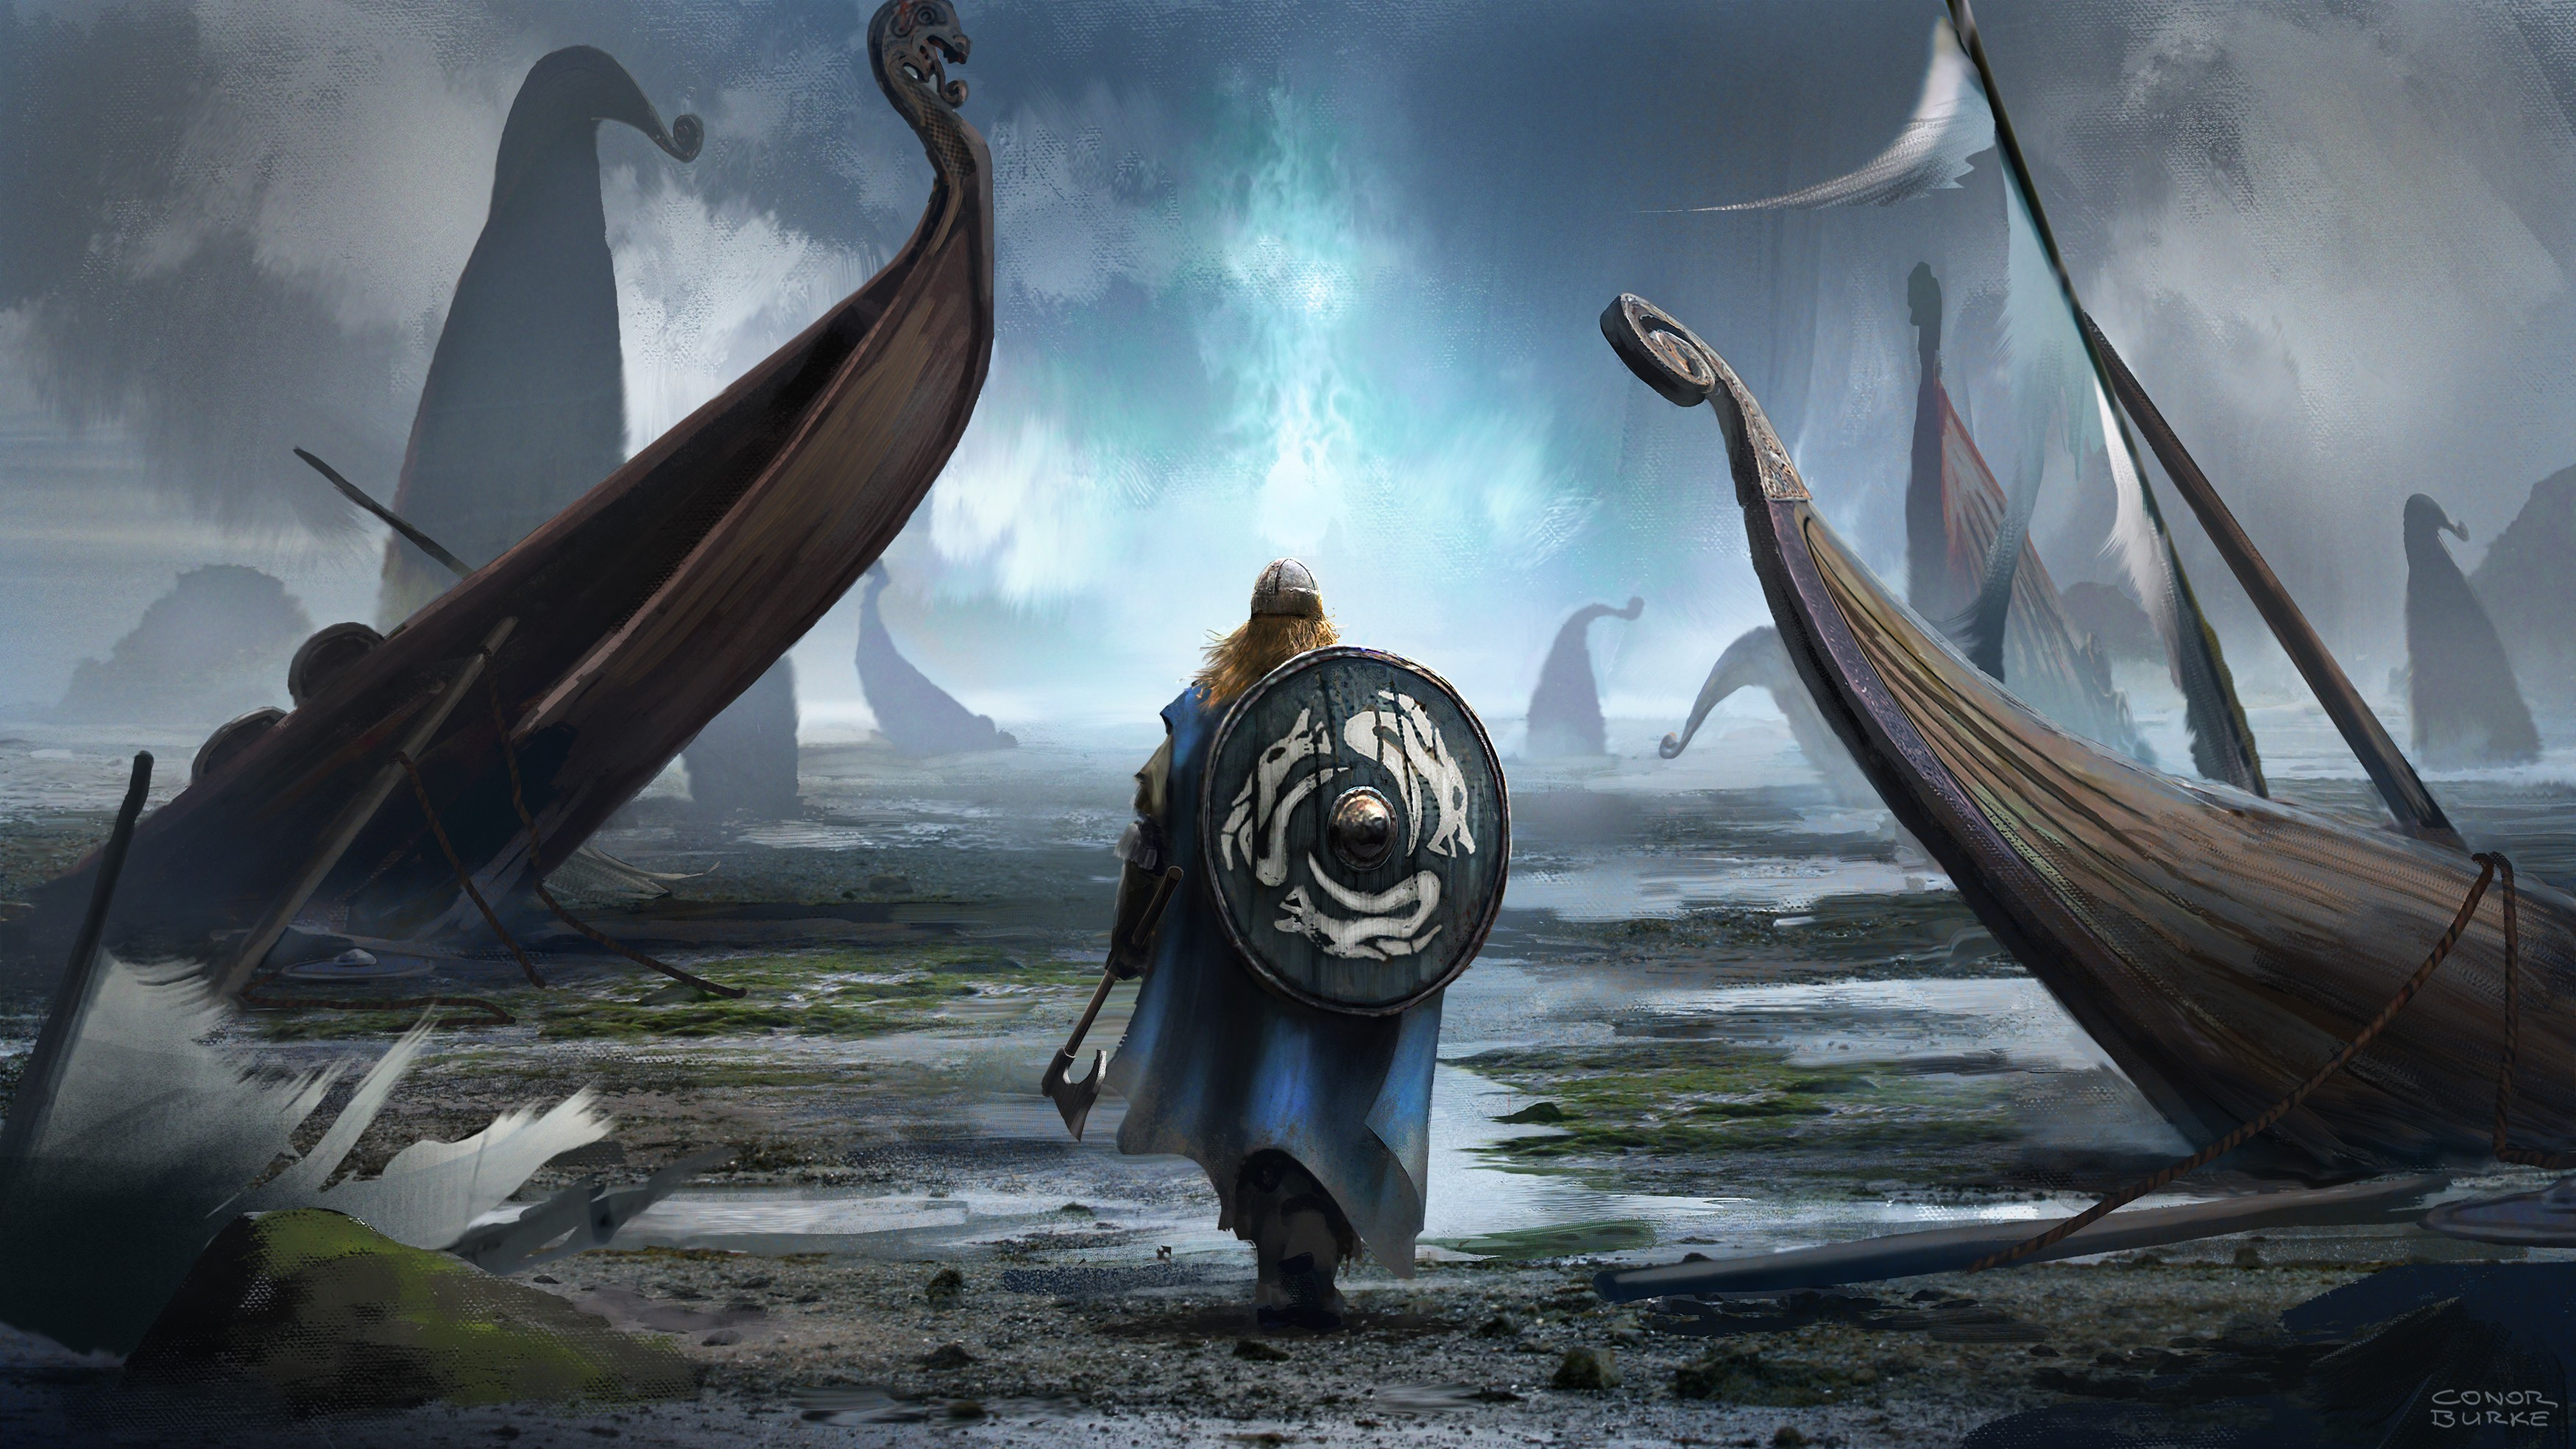 Viking HD Wallpaper | Background Image | 3500x1969 | ID:877062 - Wallpaper Abyss